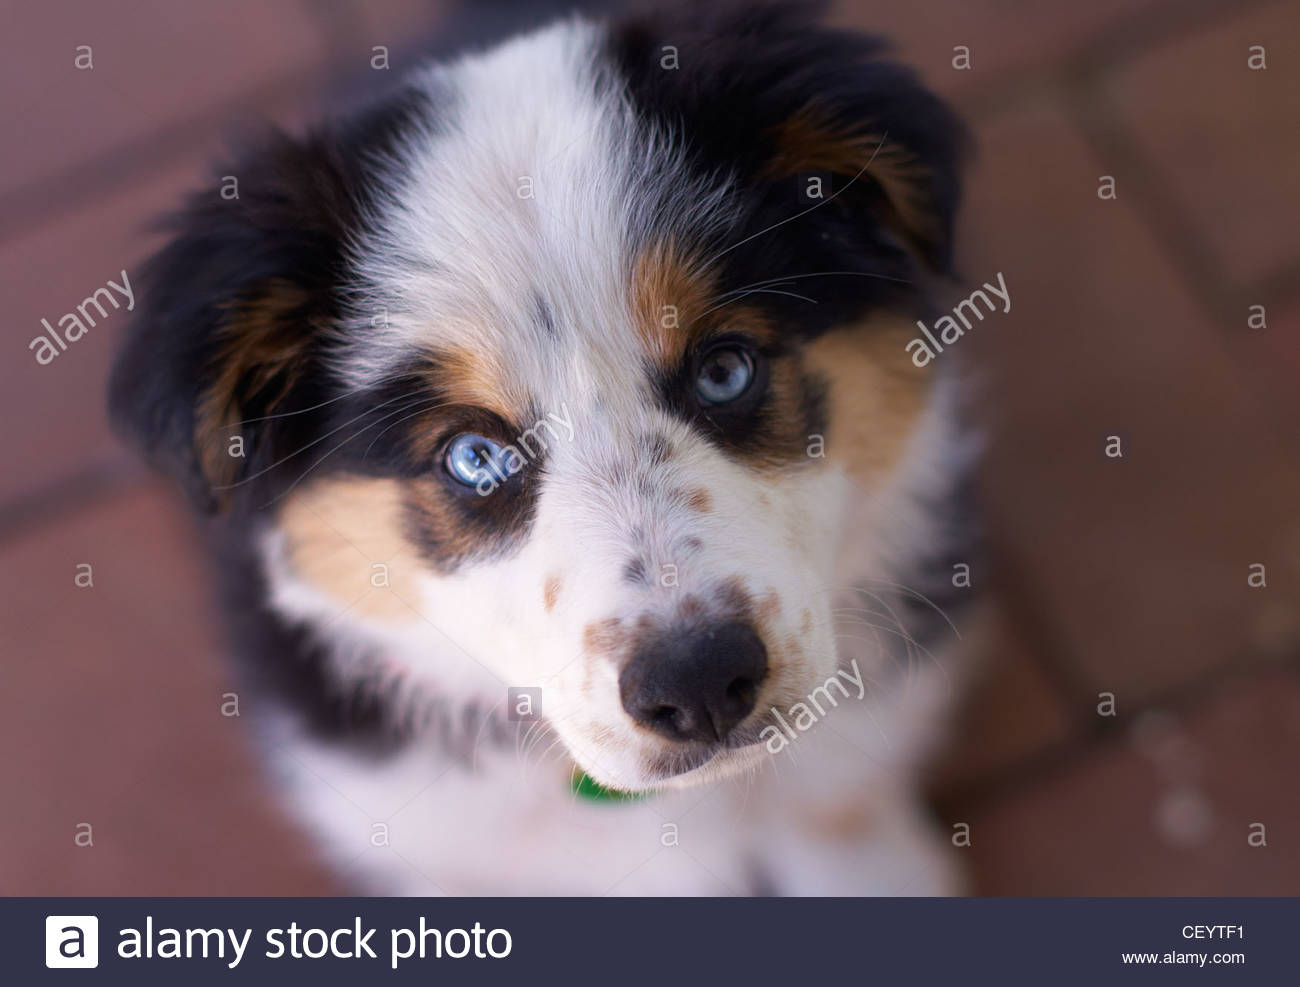 Un retrato de ojos azules, tricolores Border Collie cachorro, mirando hacia arriba con anhelo / inocentemente a Imagen De Stock